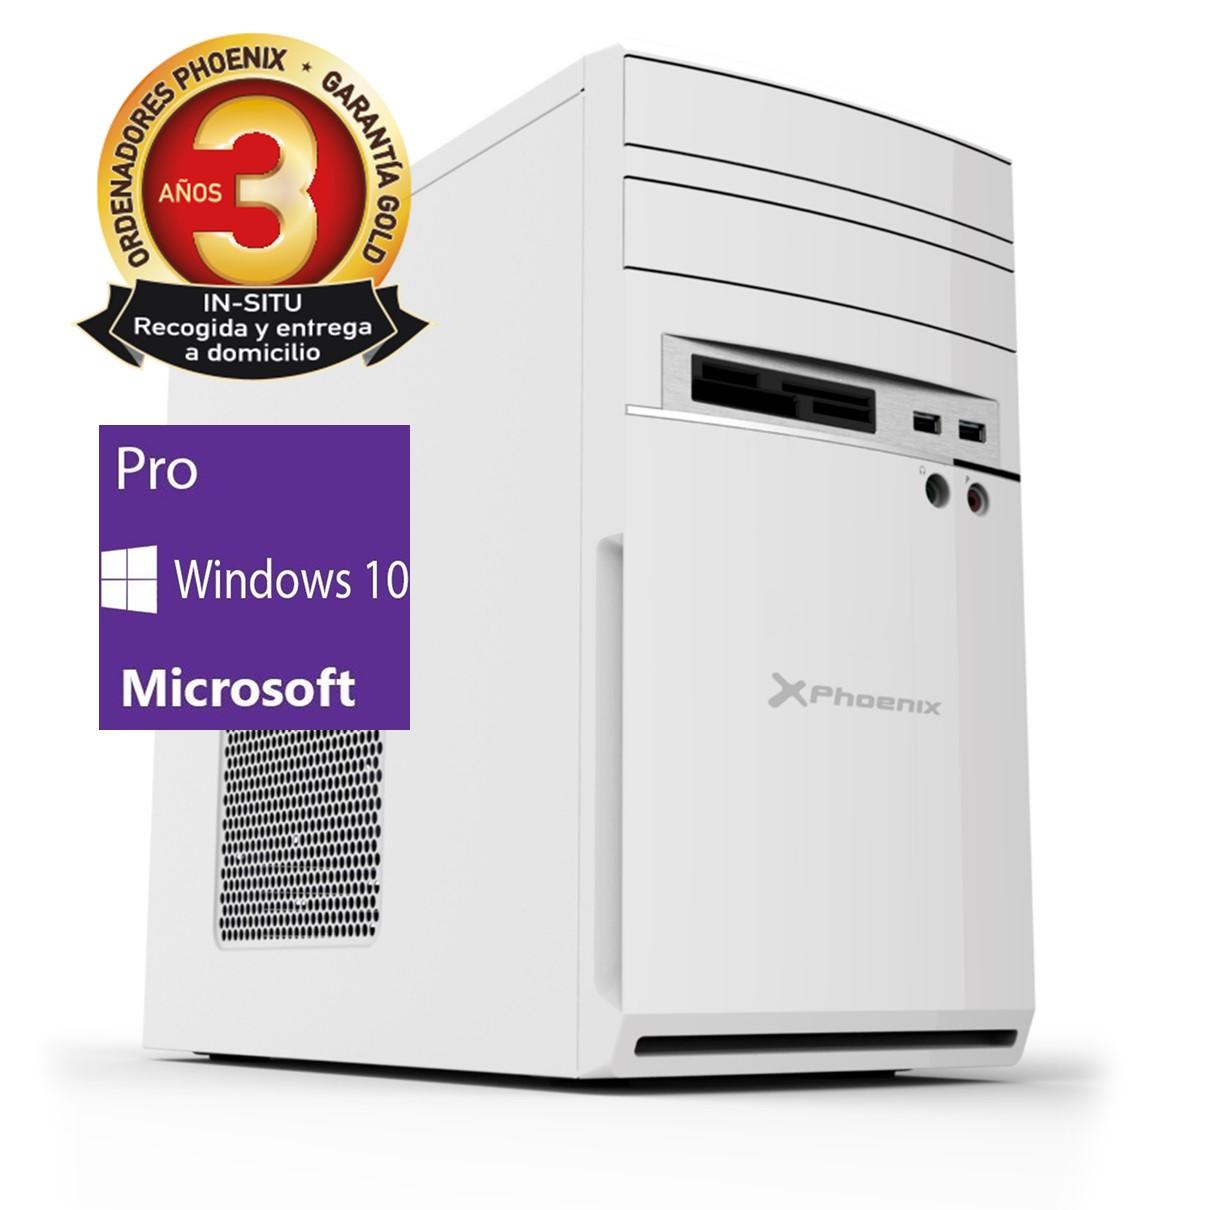 Ordenador pc phoenix moon amd ryzen 3 pro 8gb ddr4 480gb ssd rw micro atx sobremesa wifi windows 10 pro